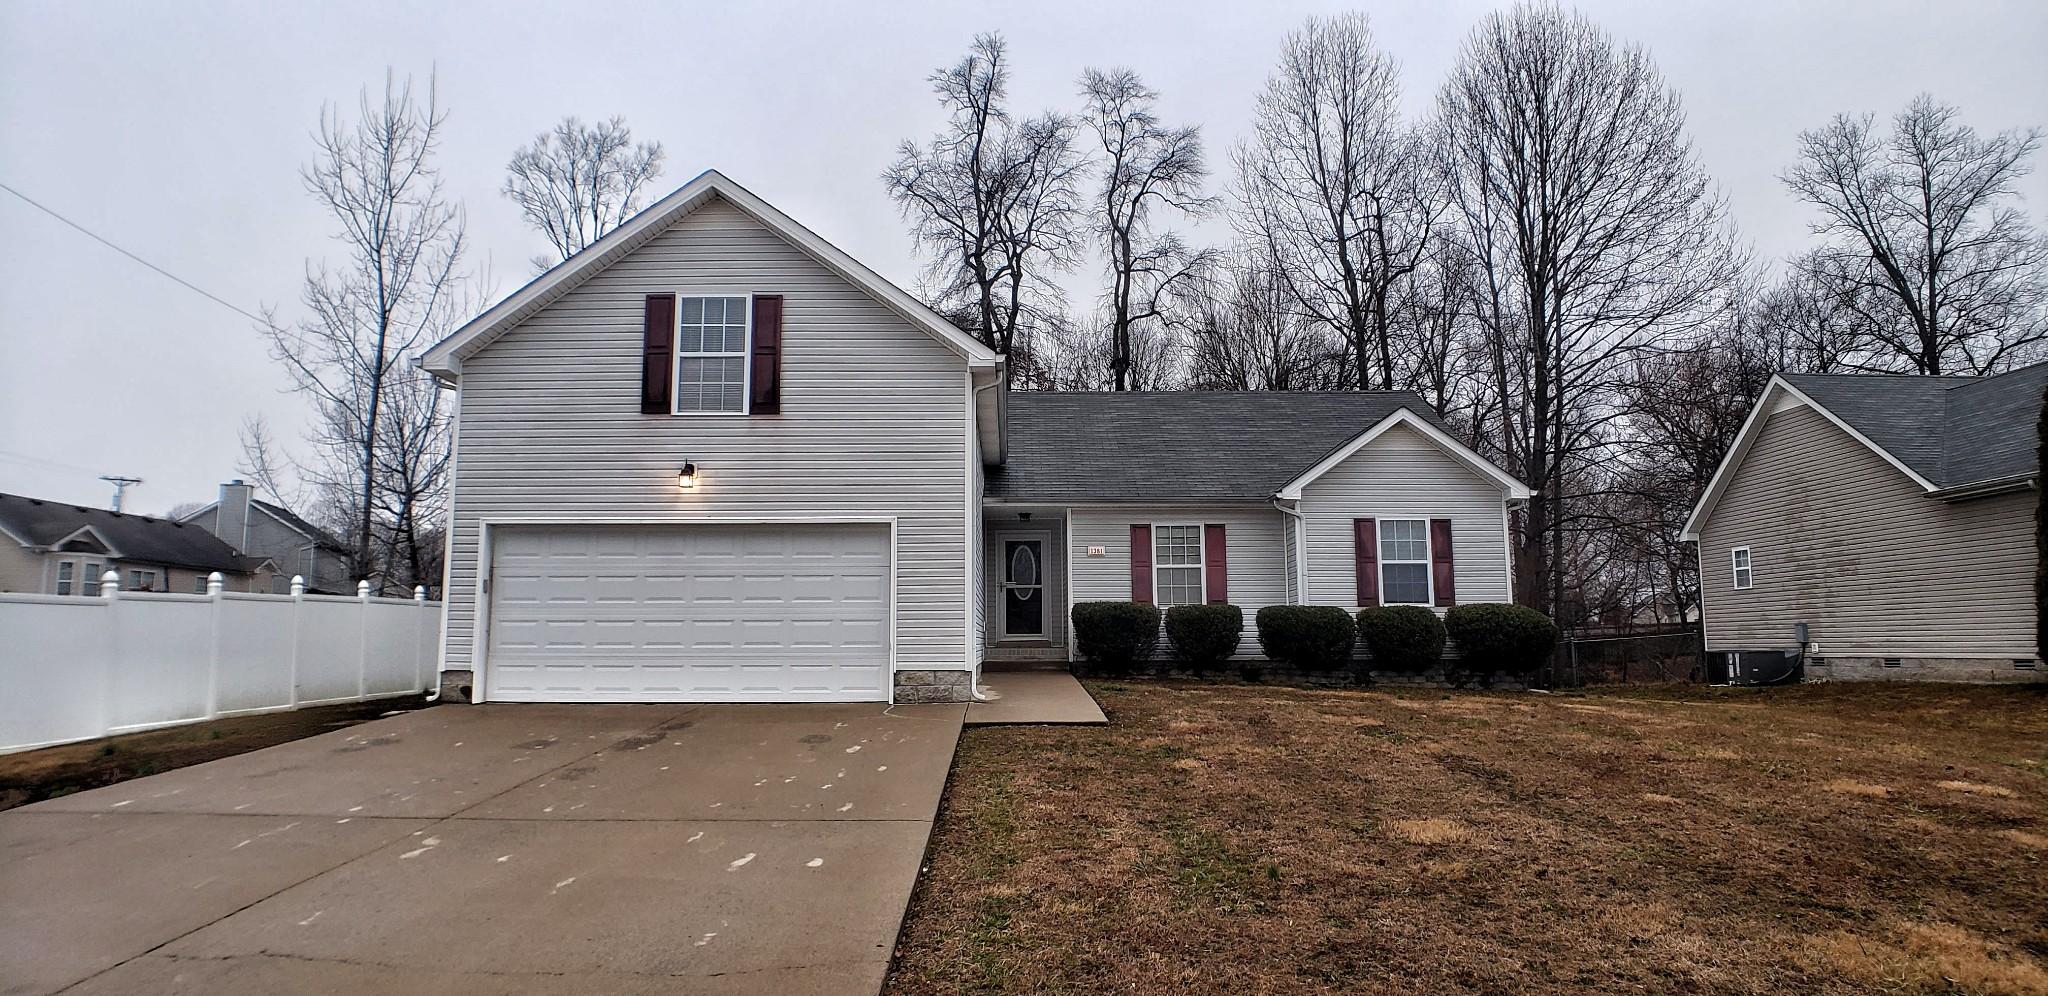 1381 Scrub Oak Dr Property Photo - Clarksville, TN real estate listing